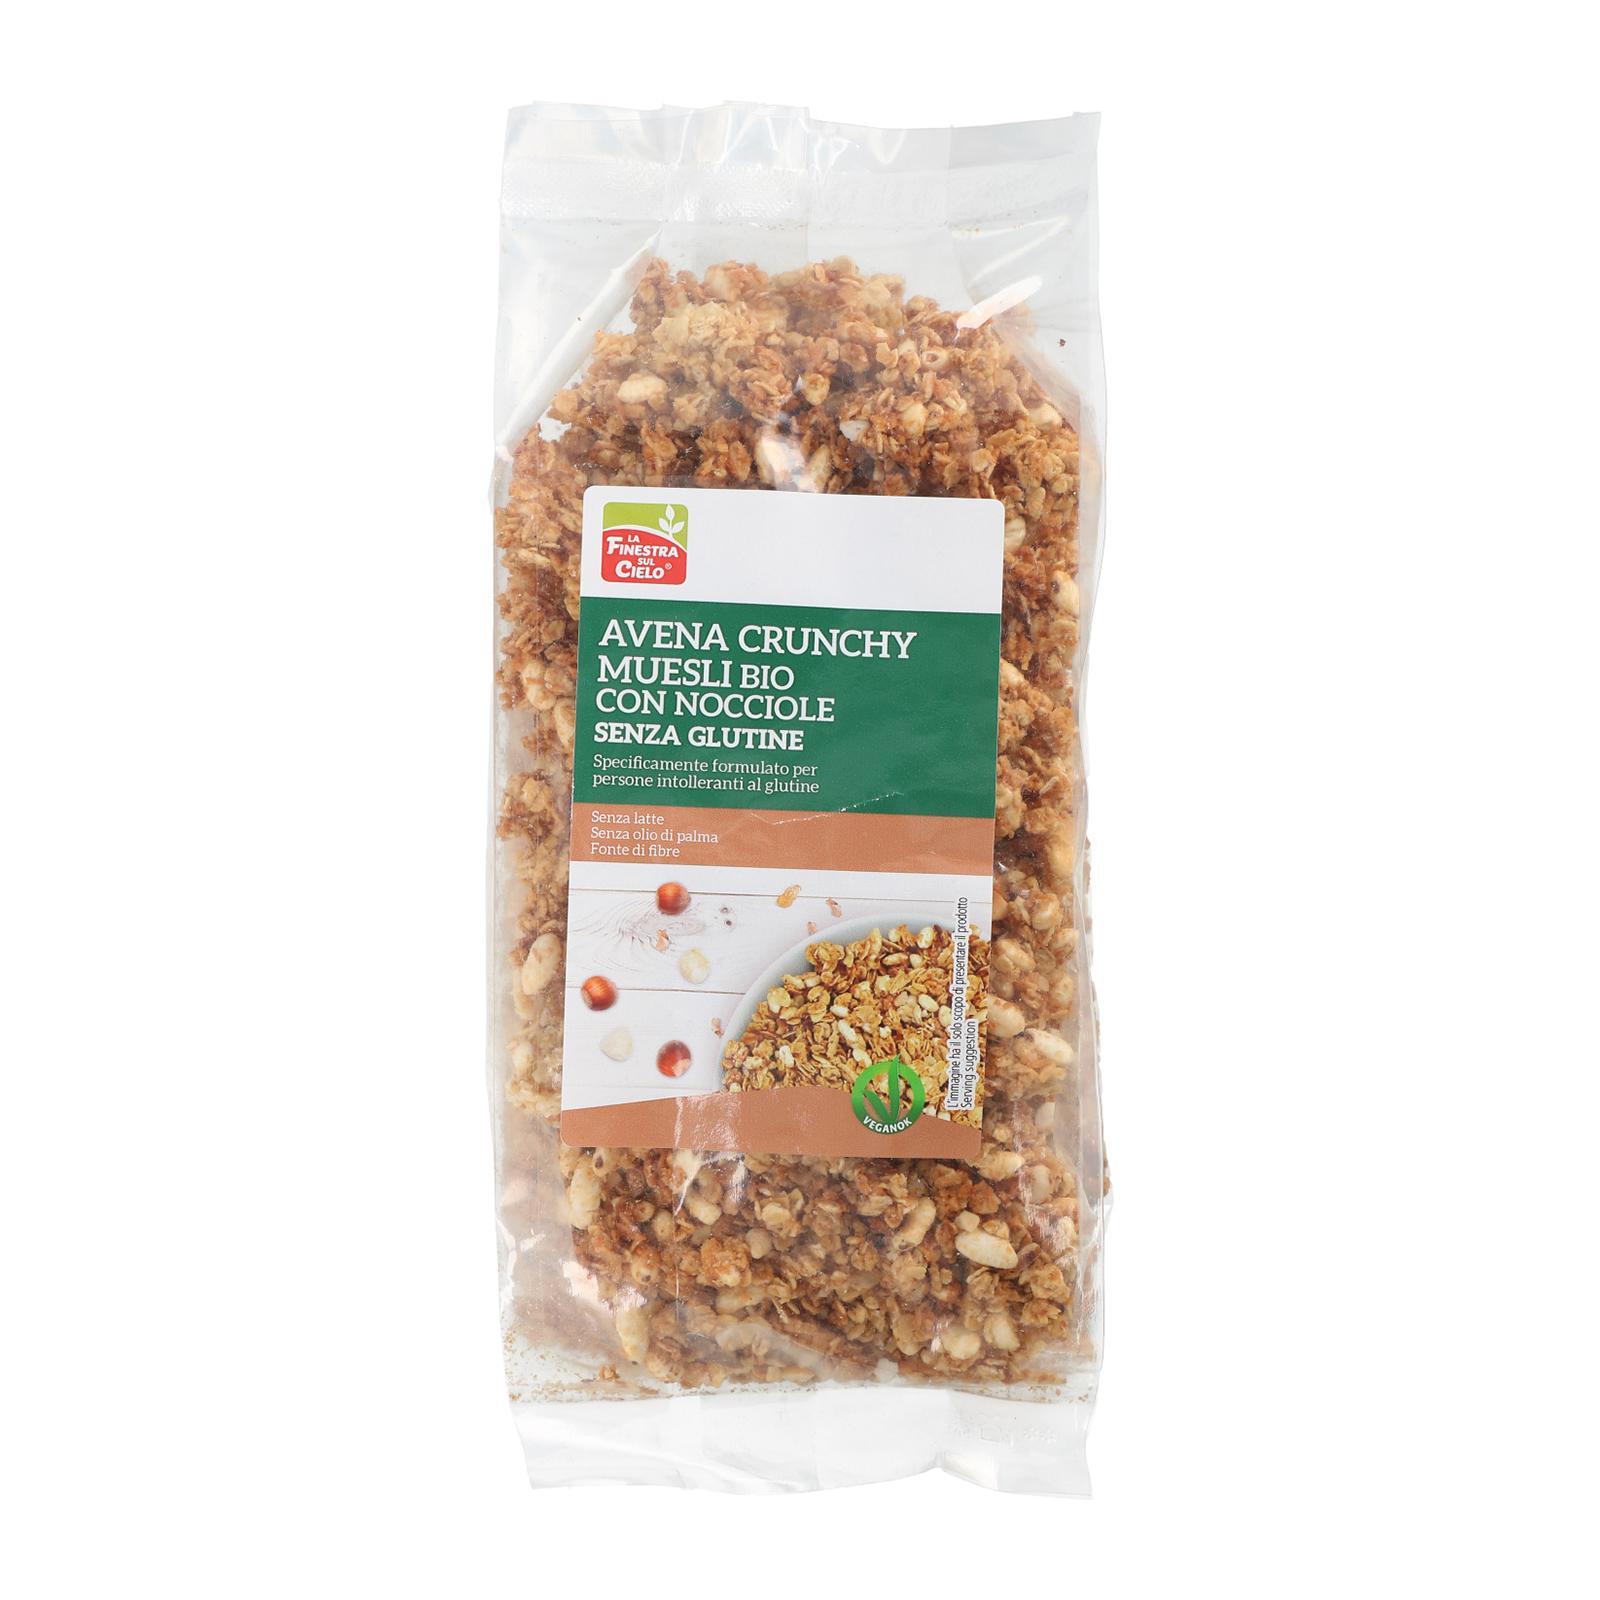 La Finestra Sul Cielo Organic Gluten Free Oats and Hazelnuts crunchy cereals